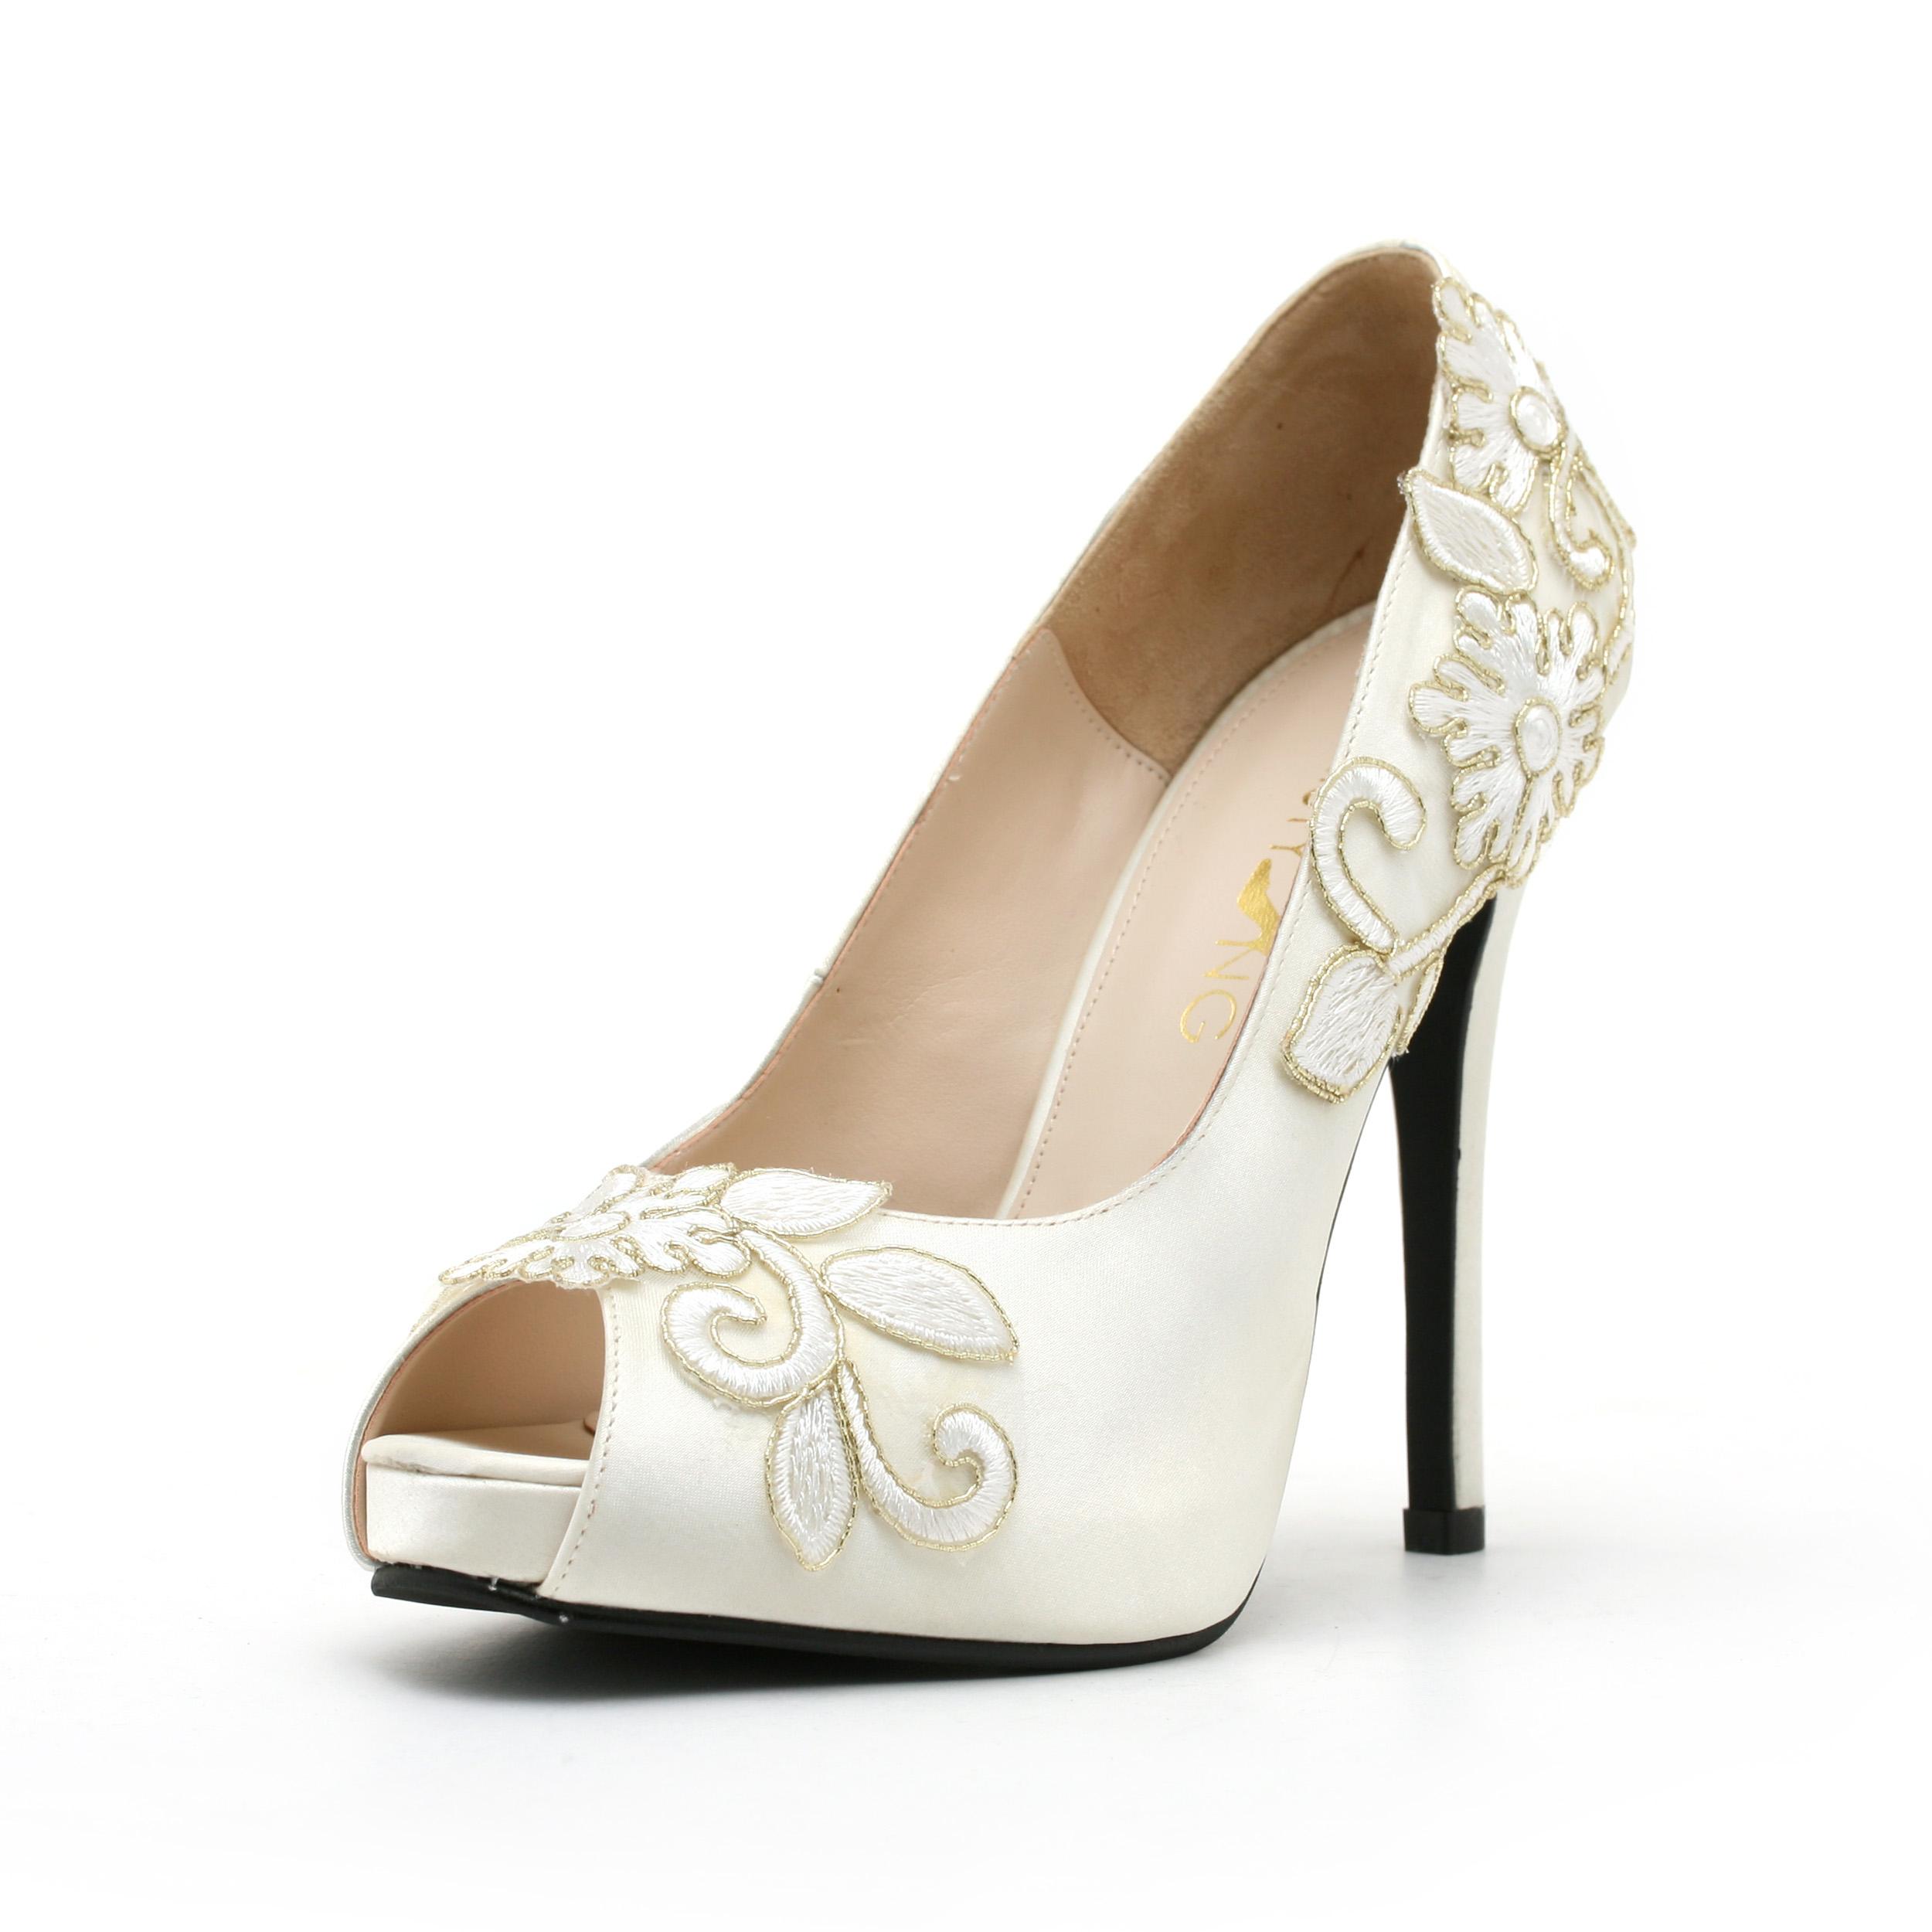 176d53a3c1e94 Beautiful Wedding Shoes Bridal Shoes Low Heel 2014 UK Wedges Flats Designer  Photos Pics Images Wallpapers